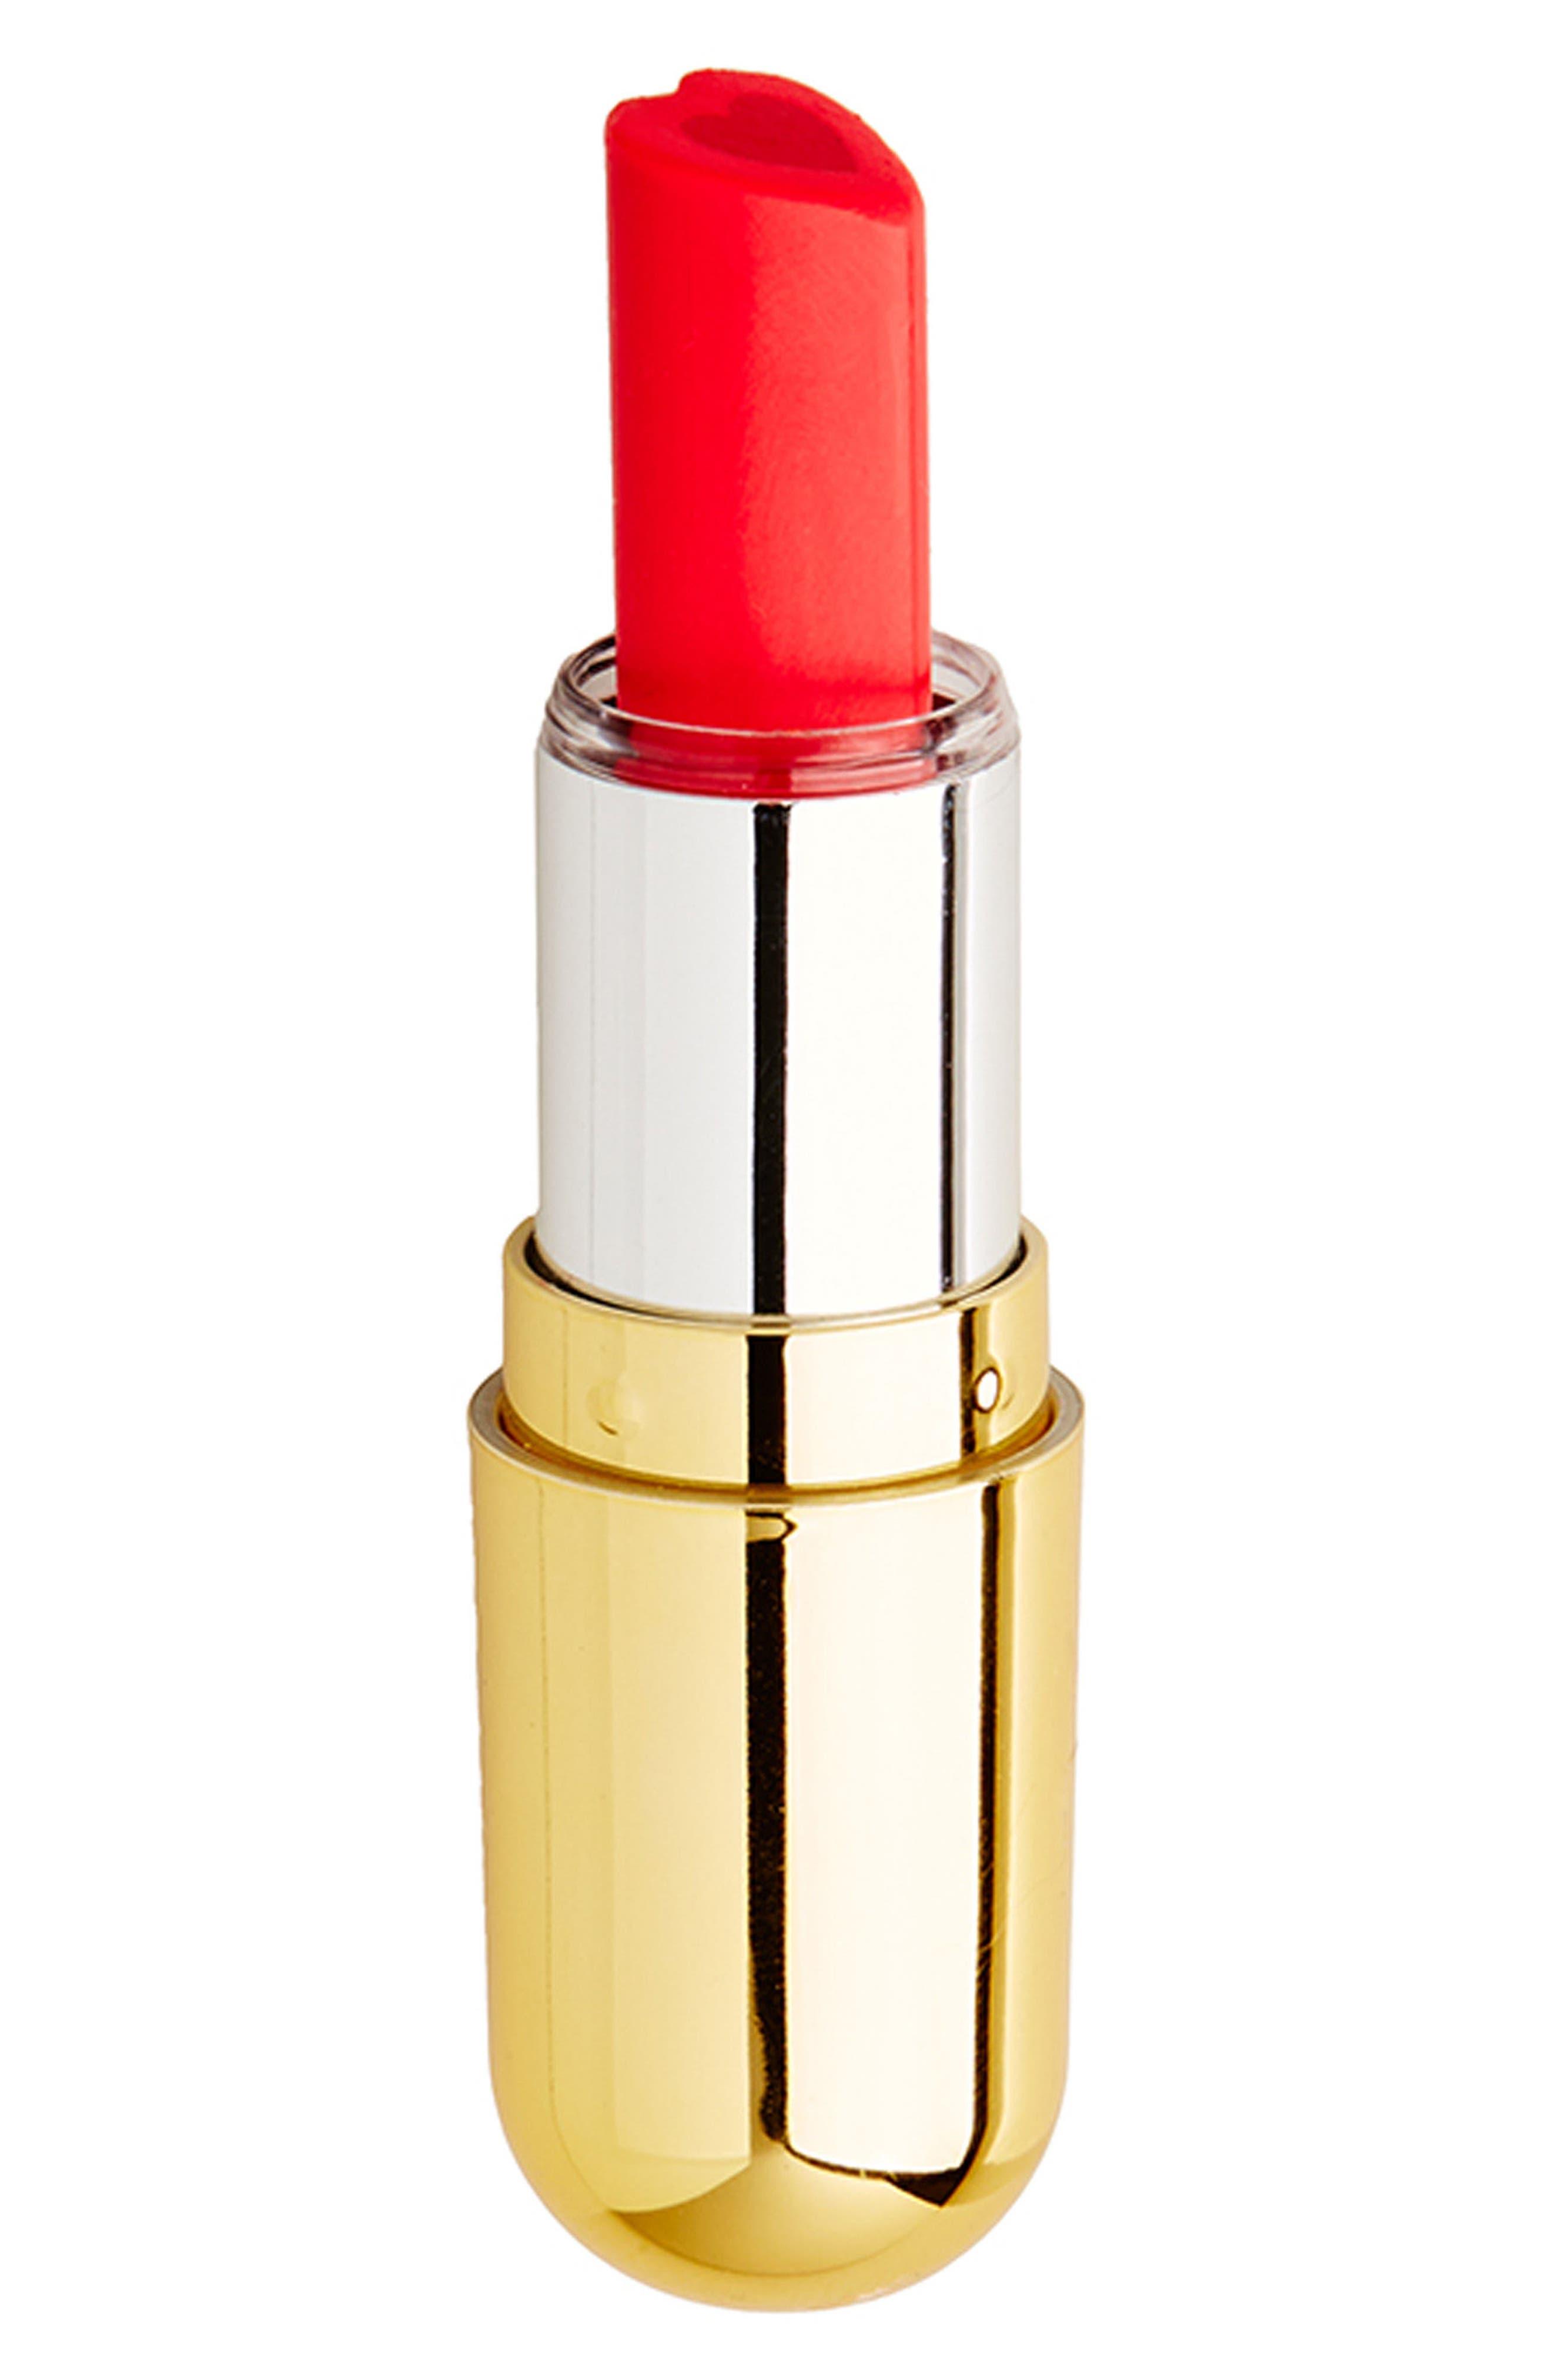 Main Image - Winky Luxe Heart Lipstick